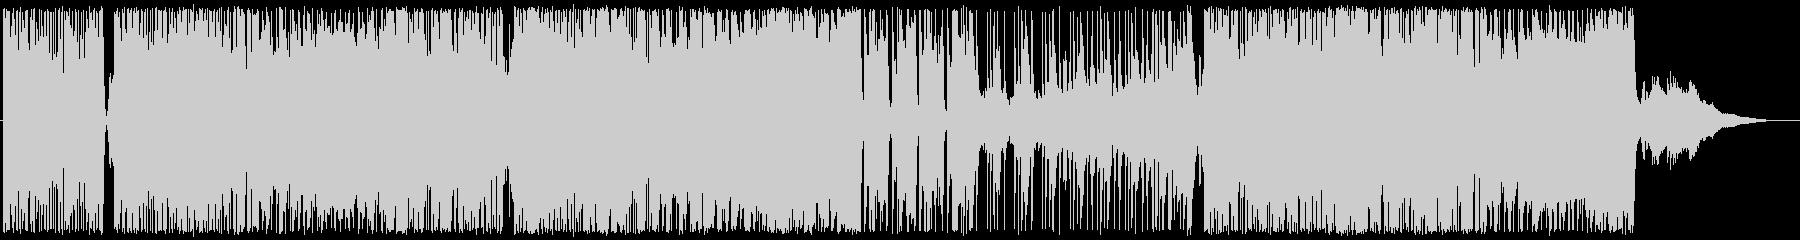 Occam's Razorの未再生の波形